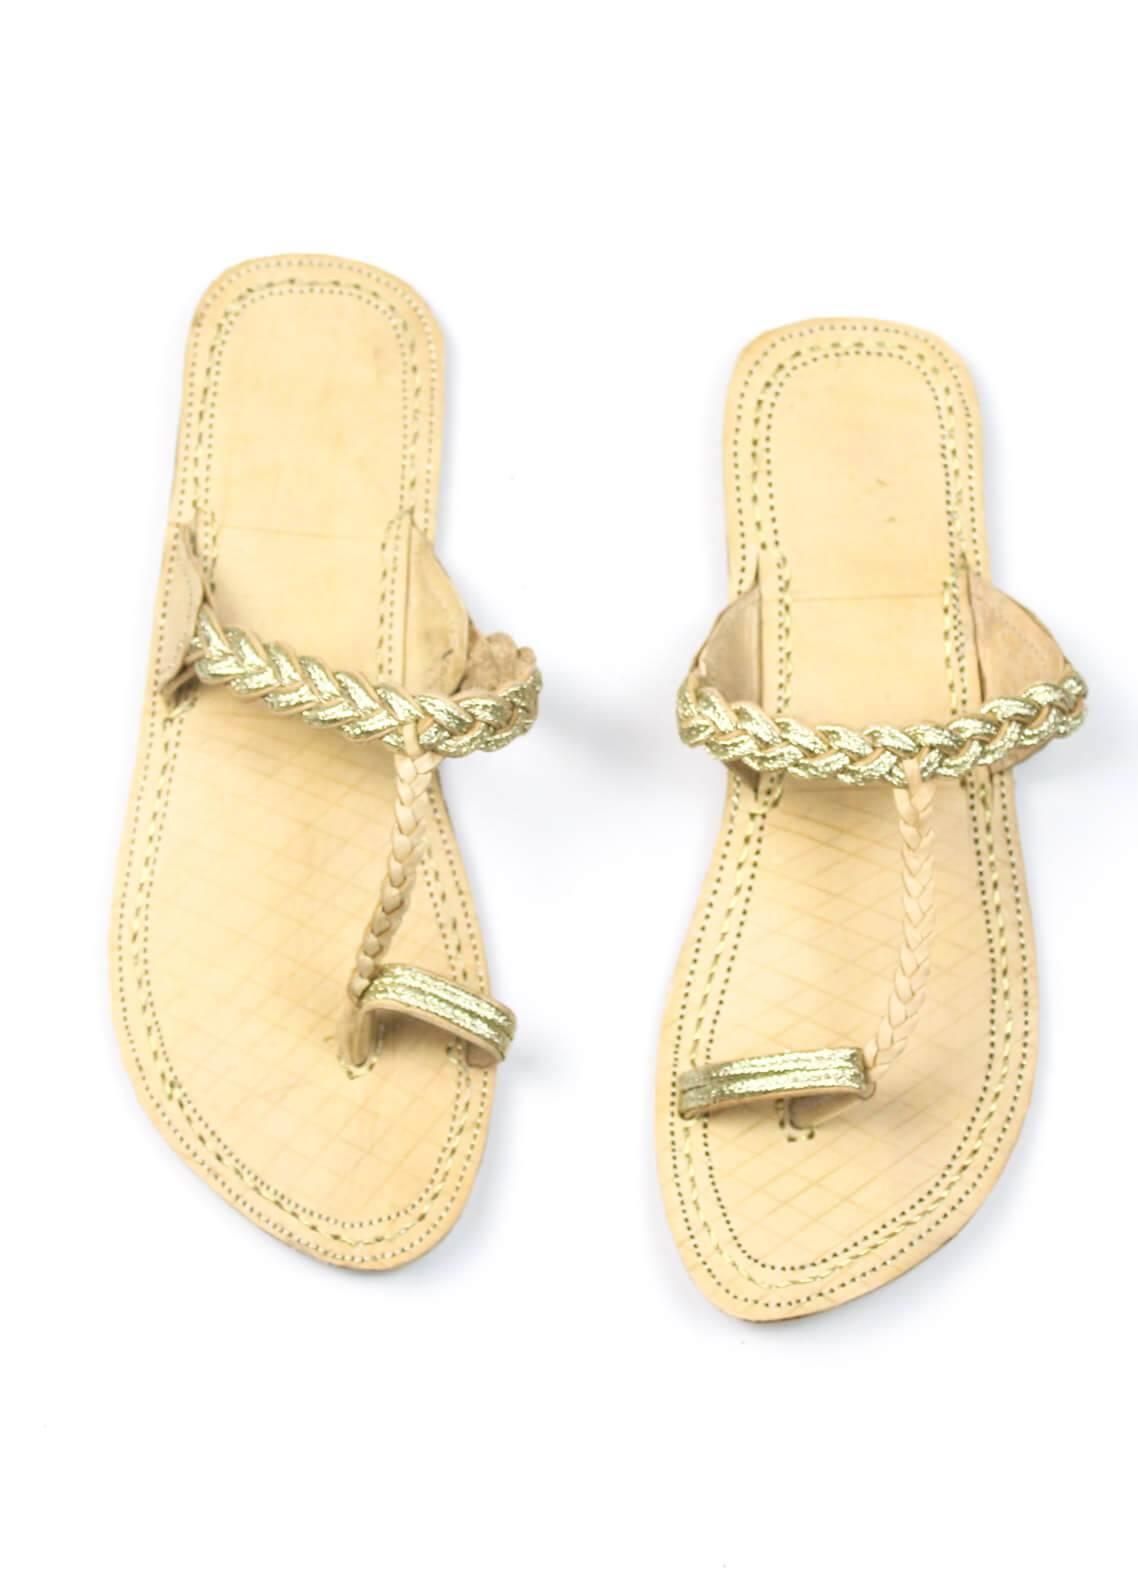 Silk Avenue Kolapuri Style Leather Flat Shoes SAF02-Gold